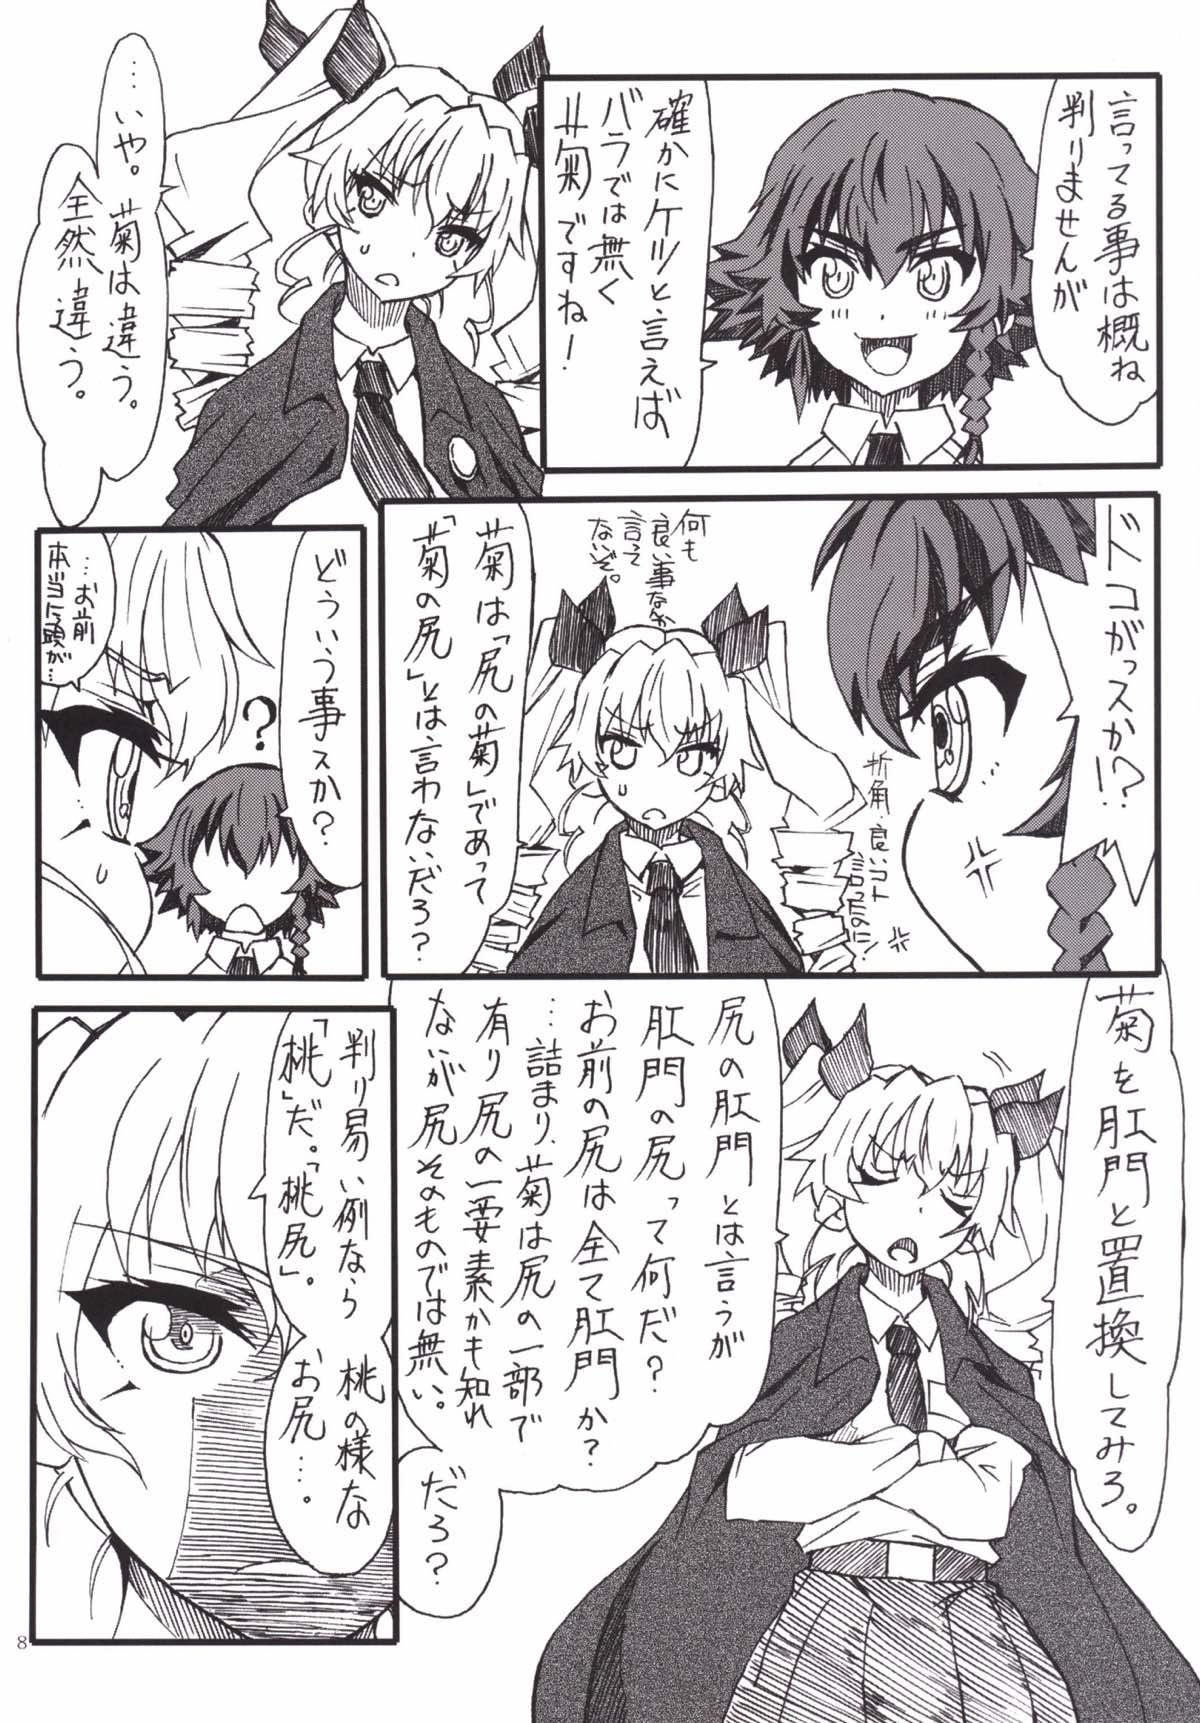 The Chiyomi 6